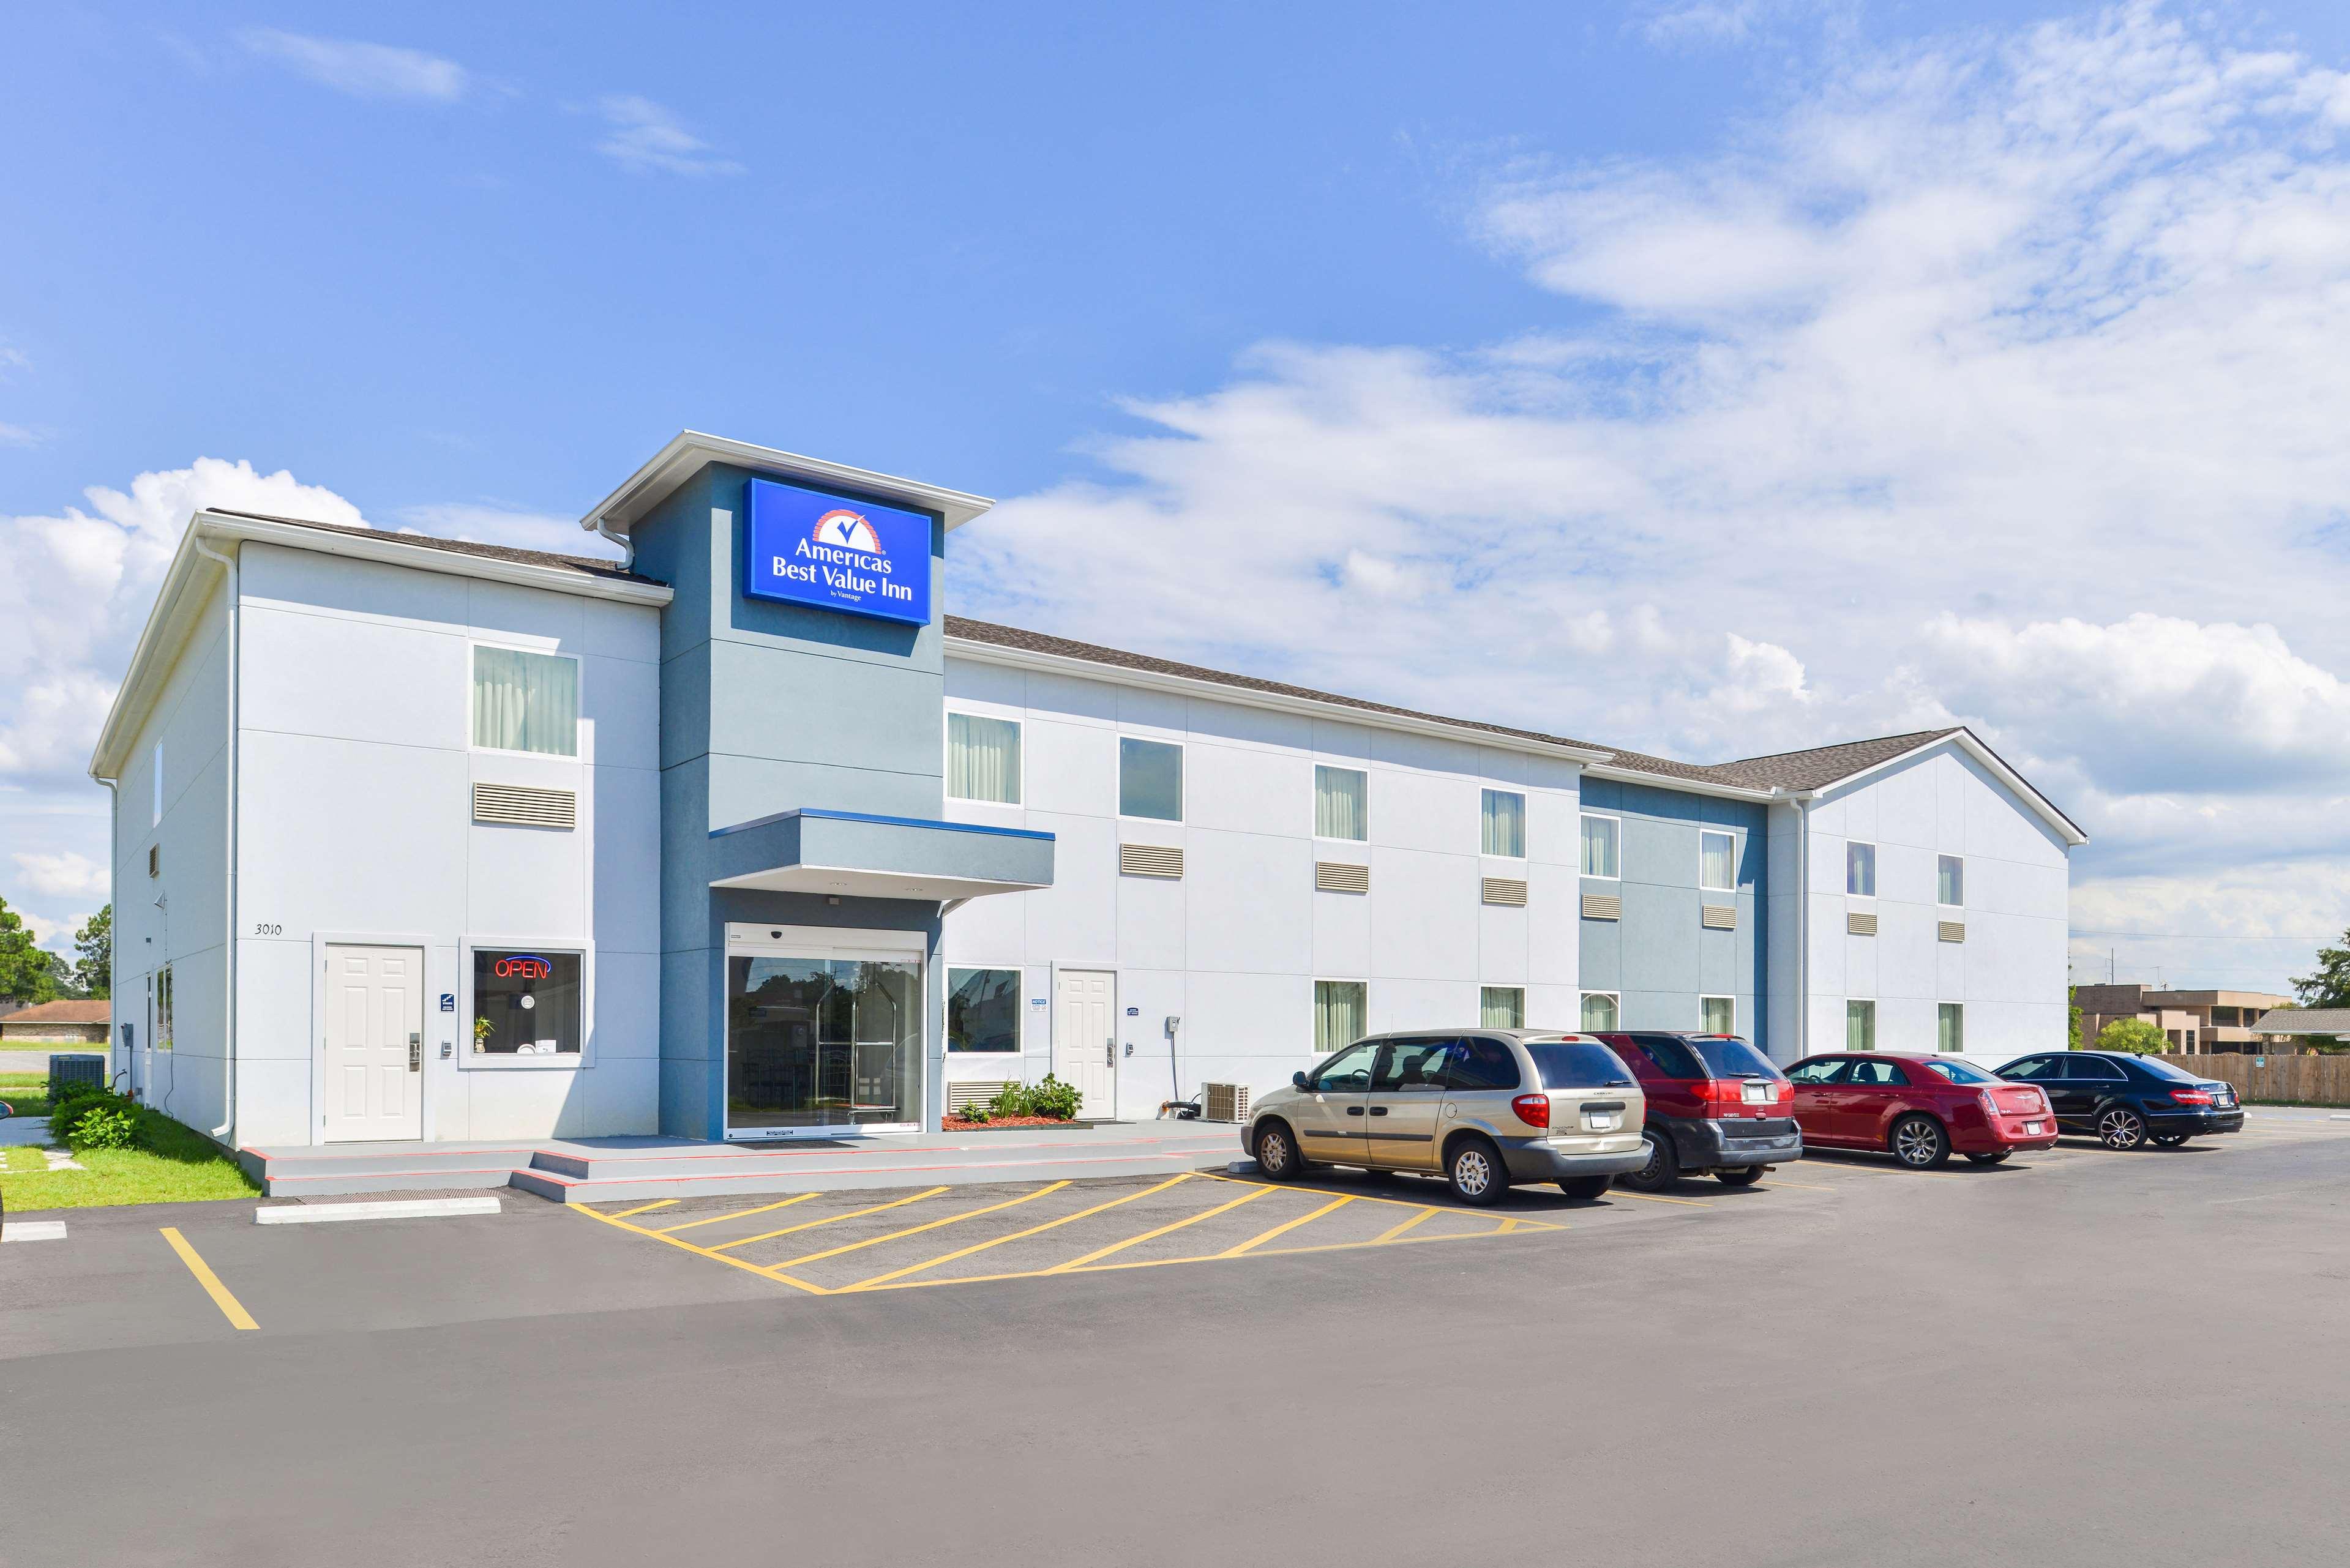 Americas Best Value Inn - Baton Rouge / College Drive image 0